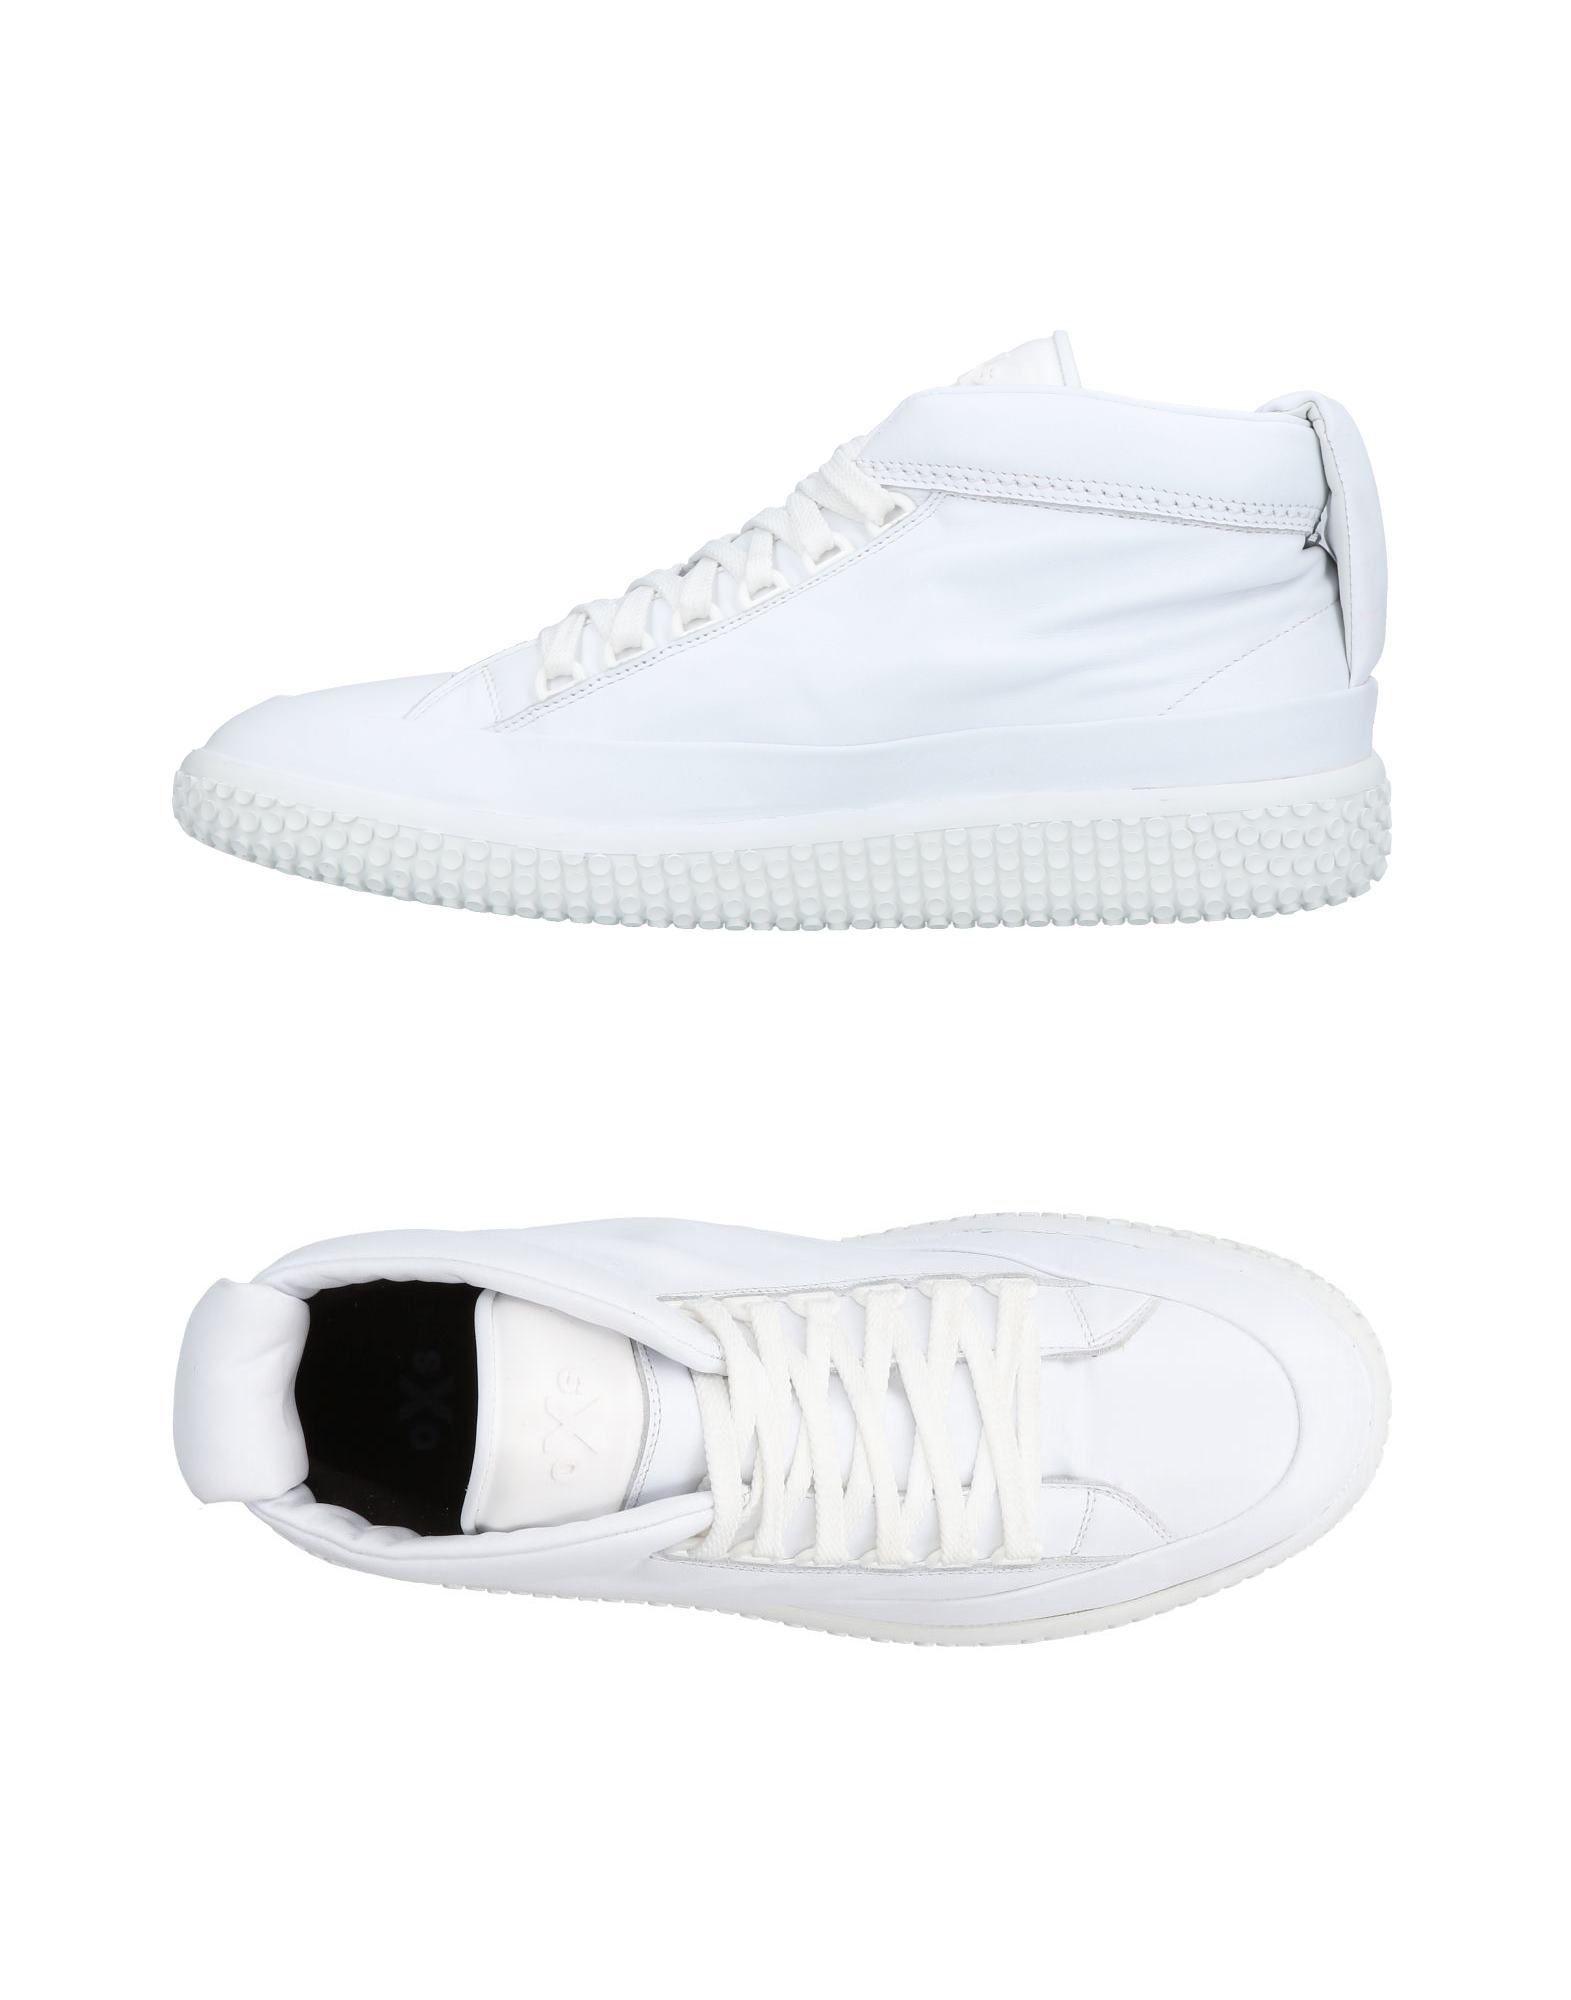 Moda Sneakers Sneakers Sneakers O.X.S. Uomo - 11457710CN 8af7f5